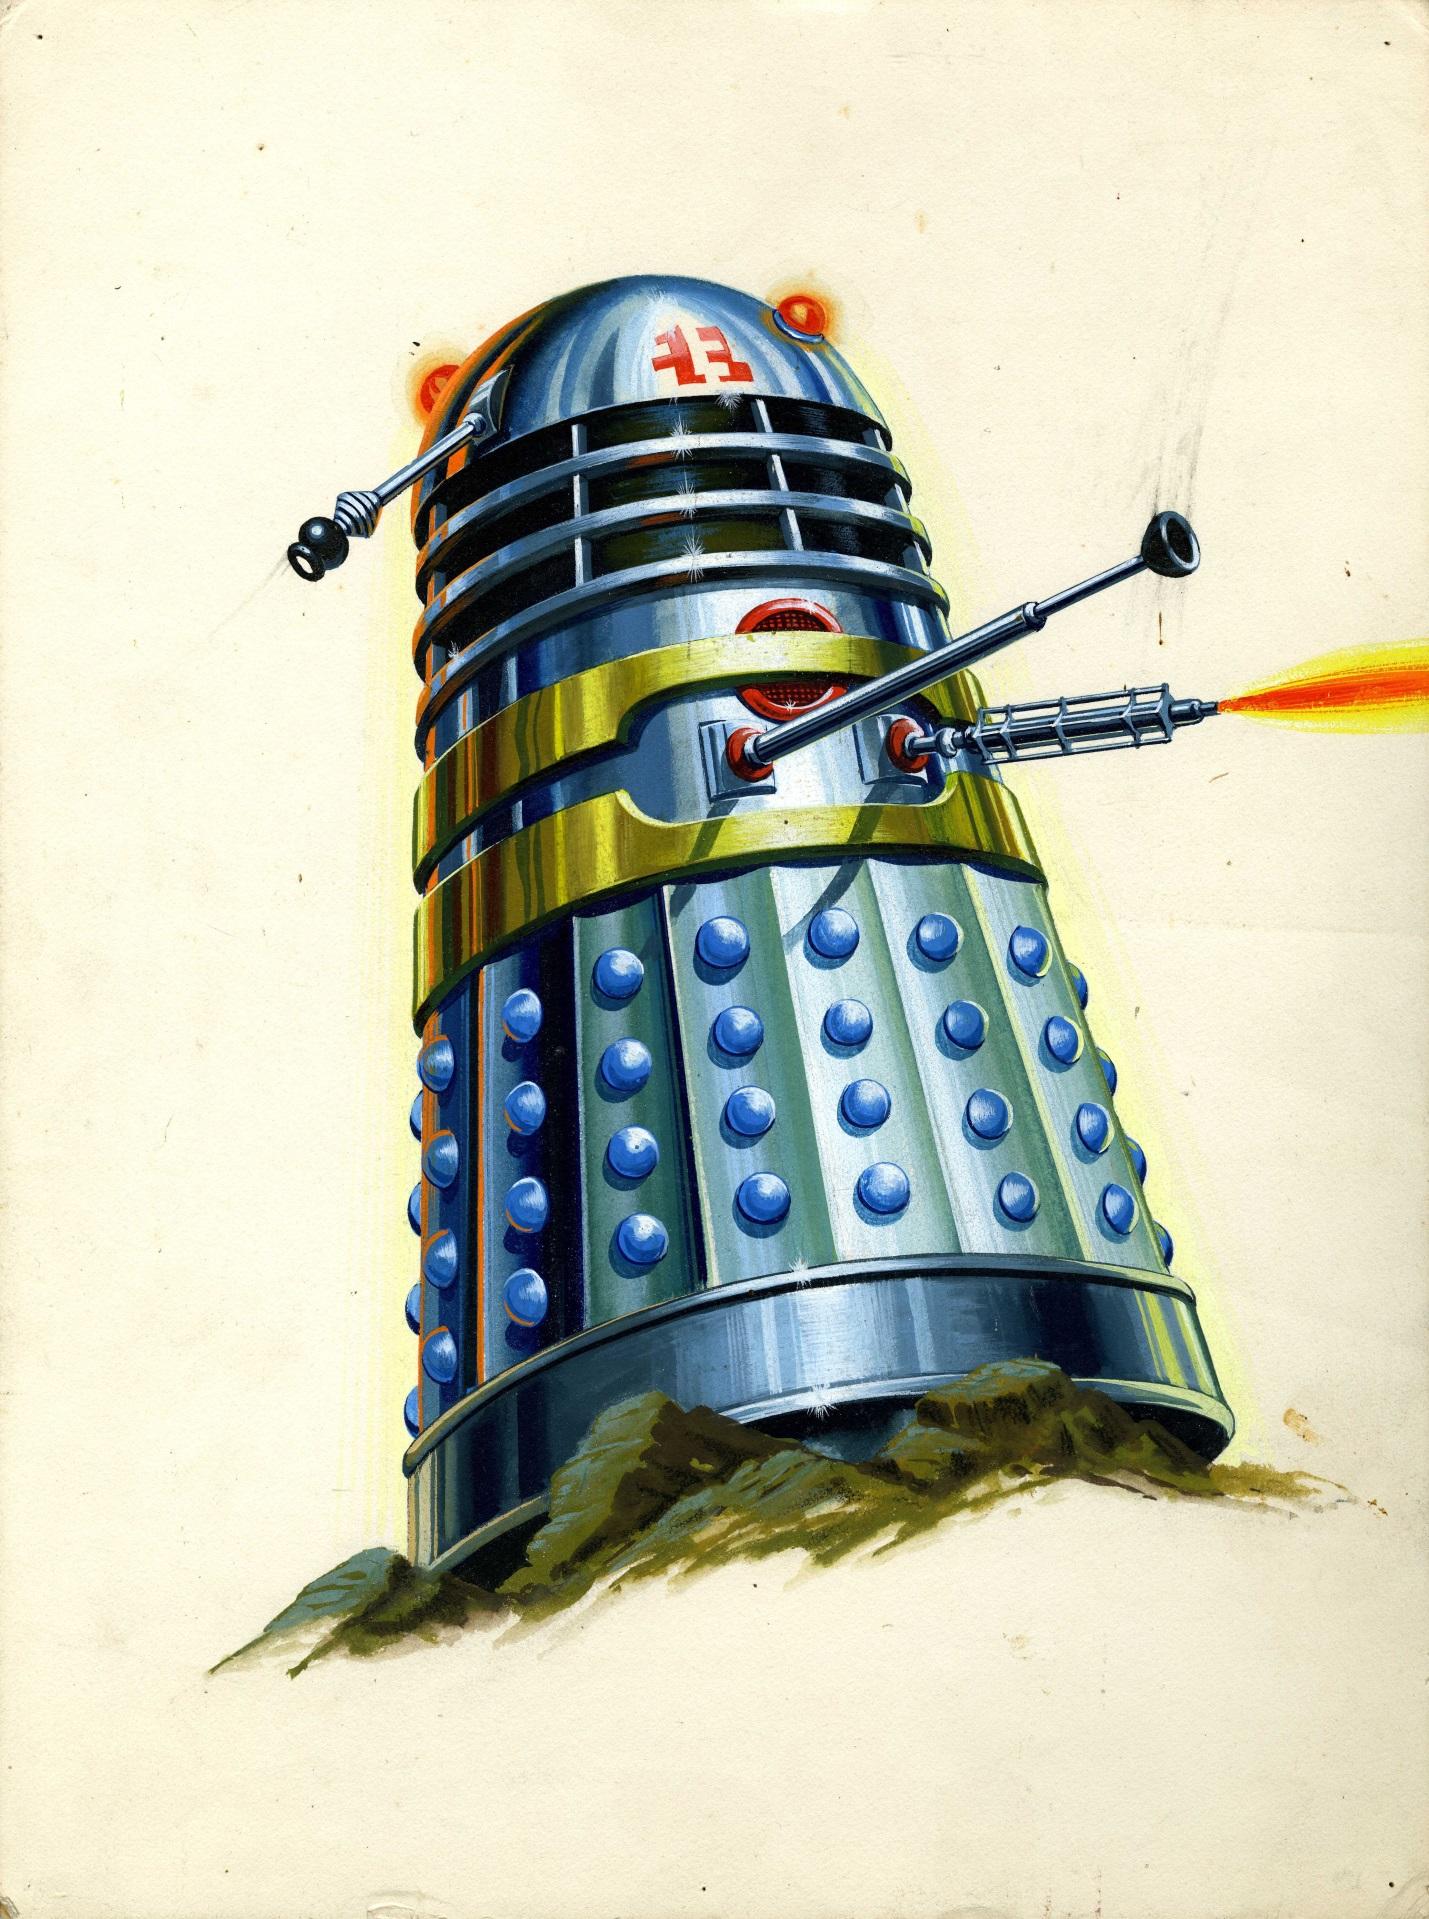 Original artwork for The Dalek Book frontispiece